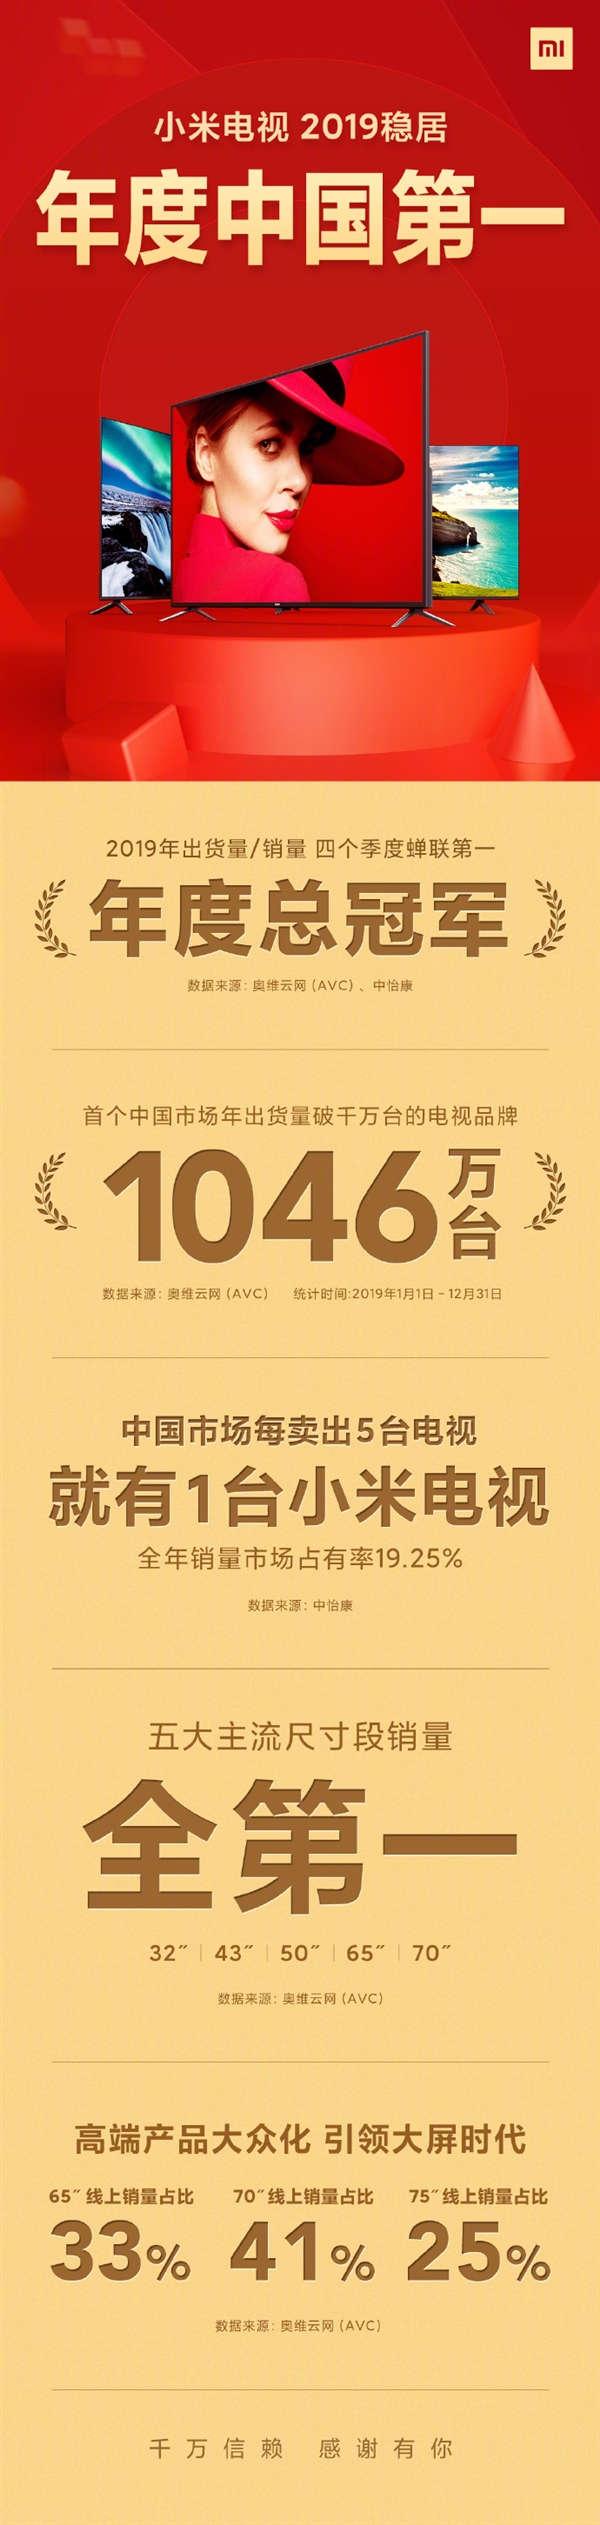 xiaomi mi tv record 2019